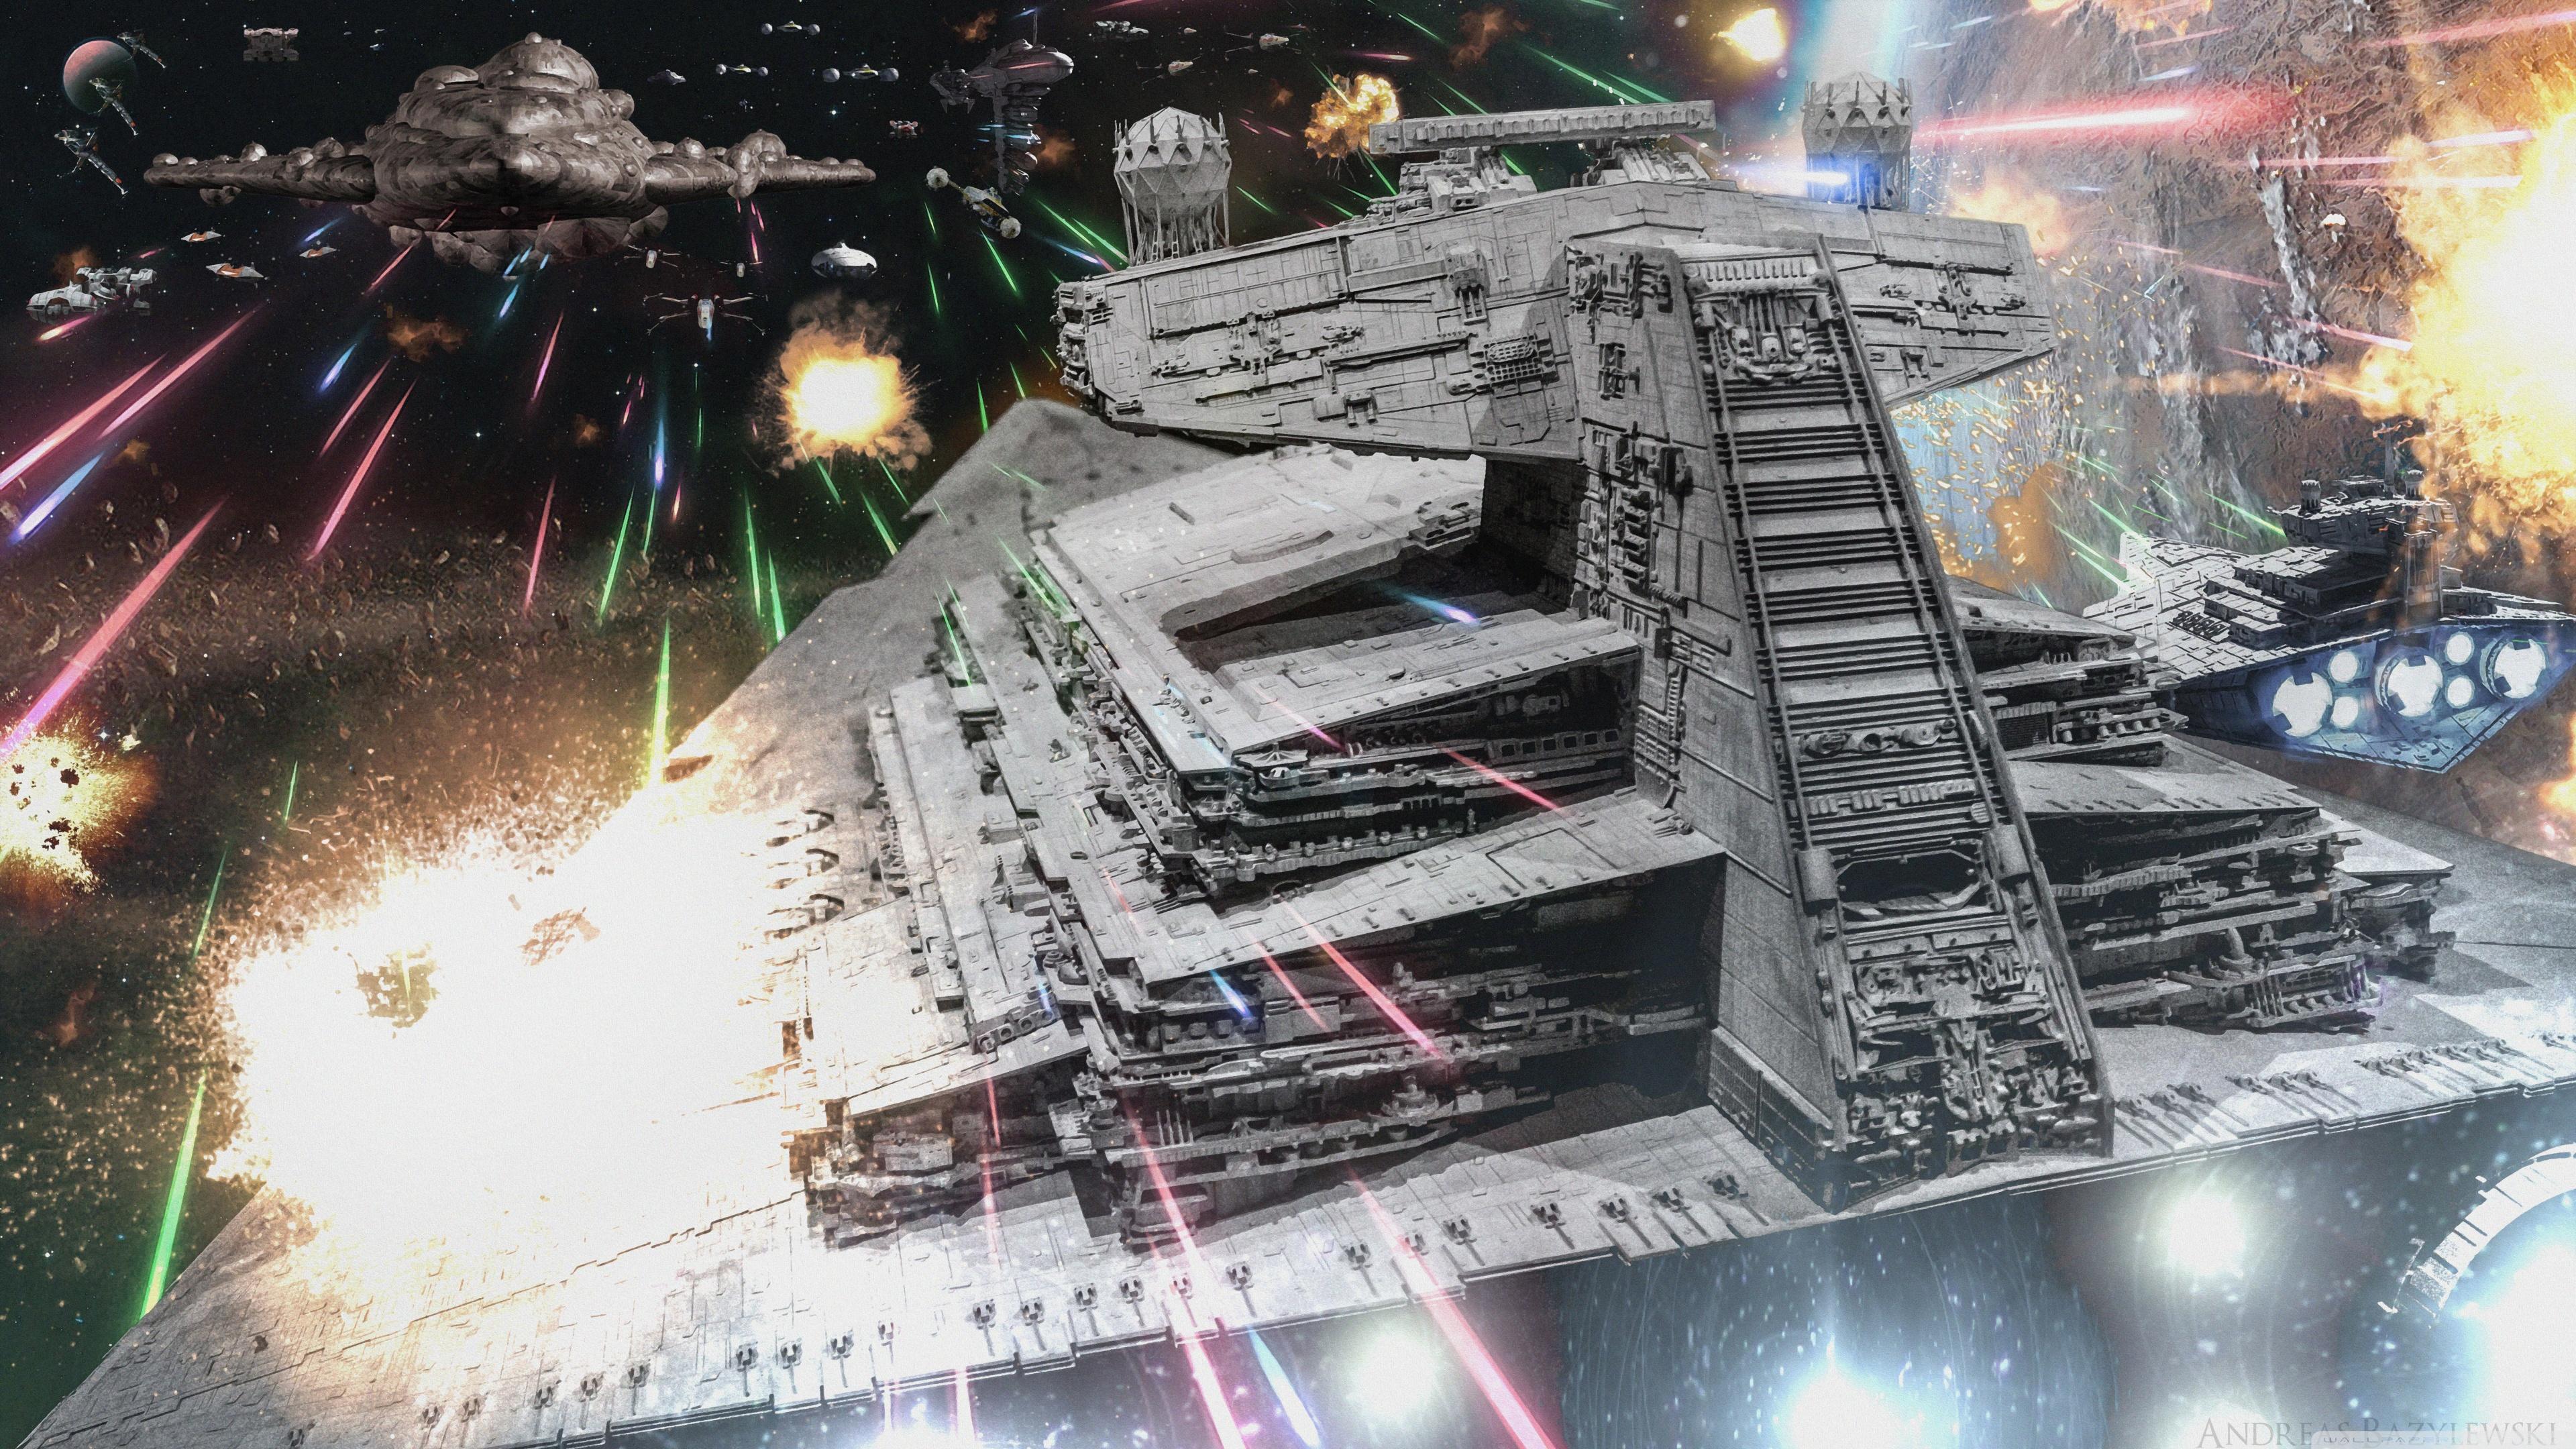 Imperial Fleet Wallpaper Posted By Sarah Walker